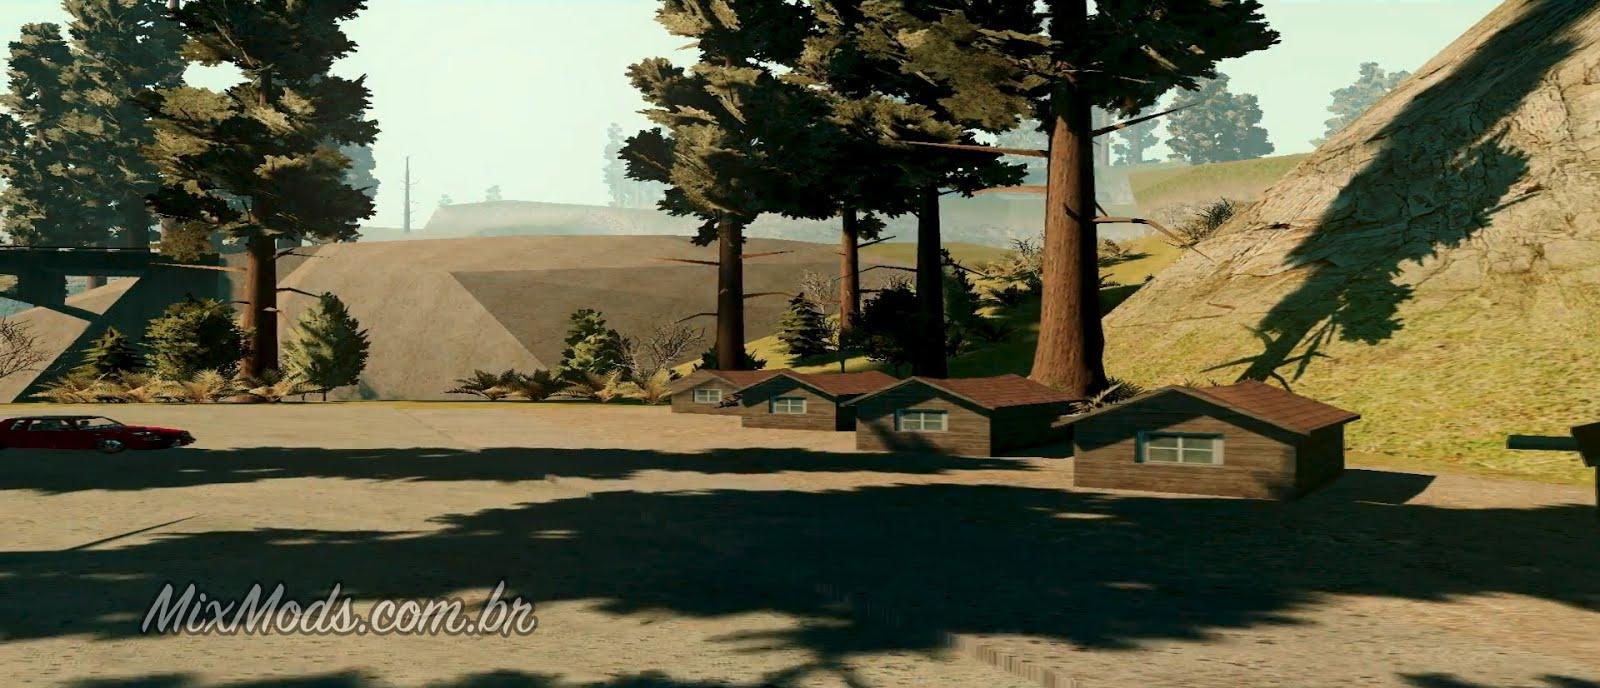 RenderHook (by PetkaGTA) - | MixMods | Mods para GTA SA e outros